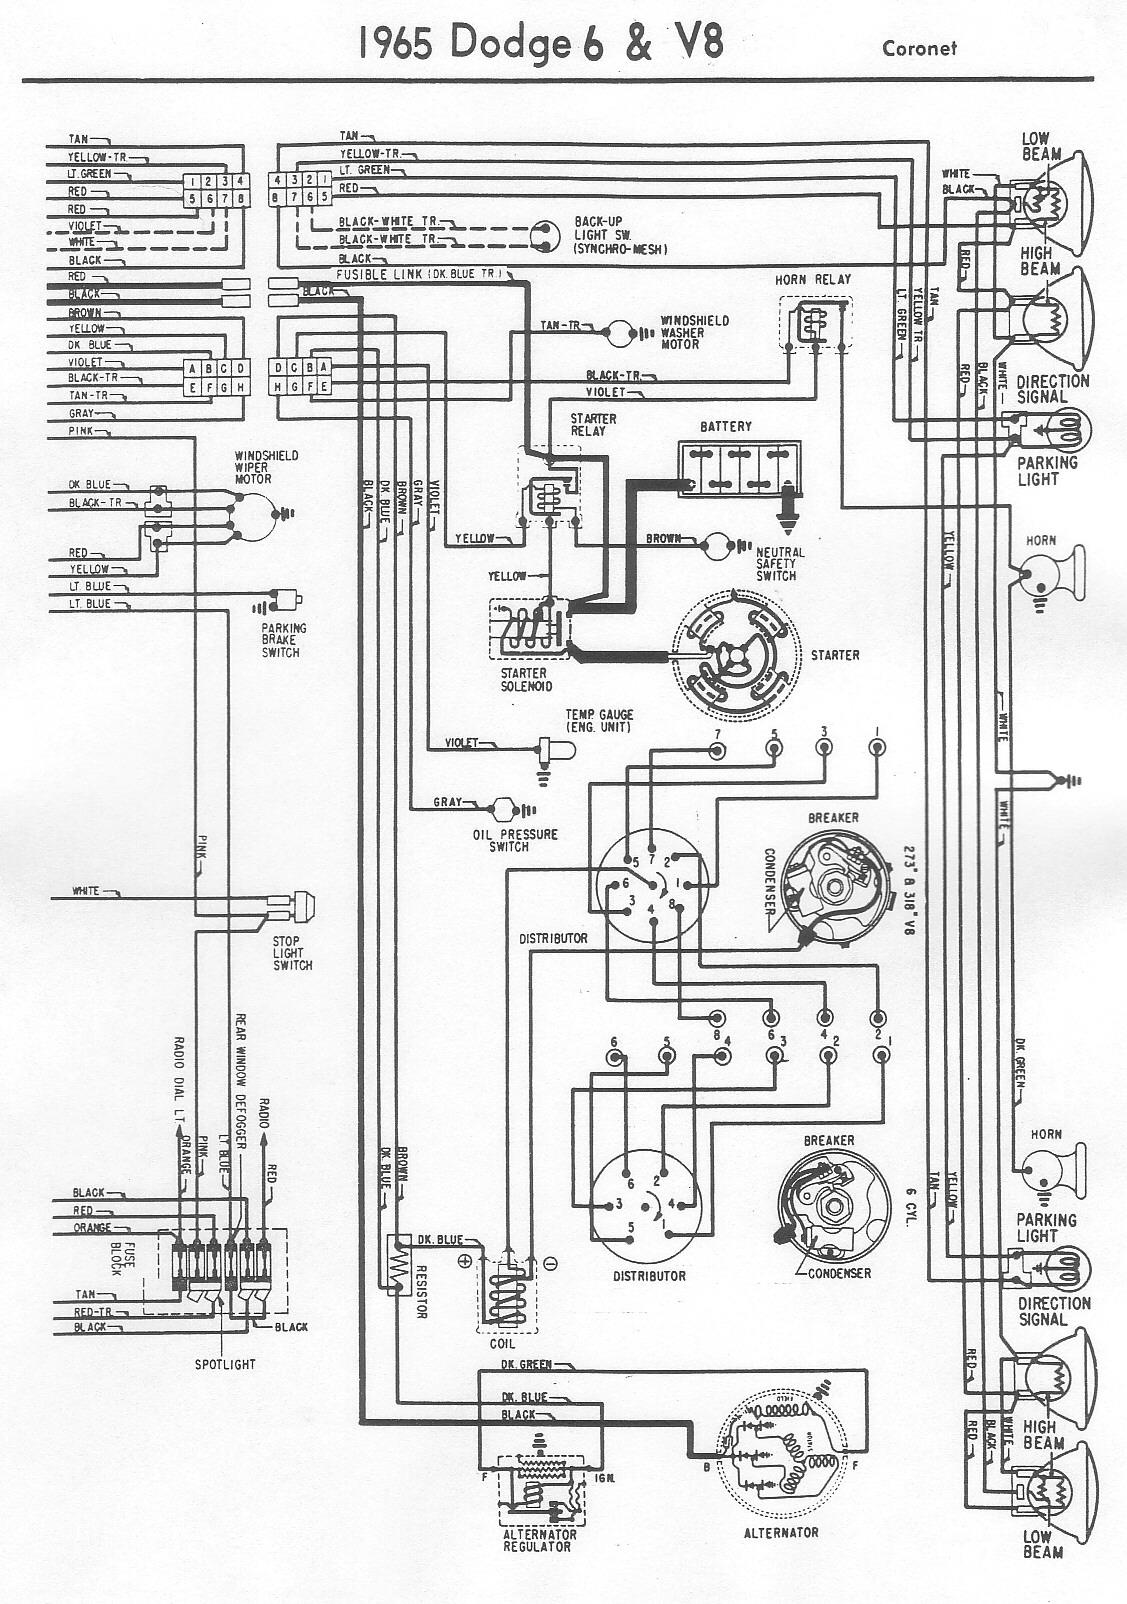 1969 plymouth alternator wiring diagram wiring diagram z11966 plymouth alternator wiring wiring diagram battery to alternator [ 1127 x 1604 Pixel ]